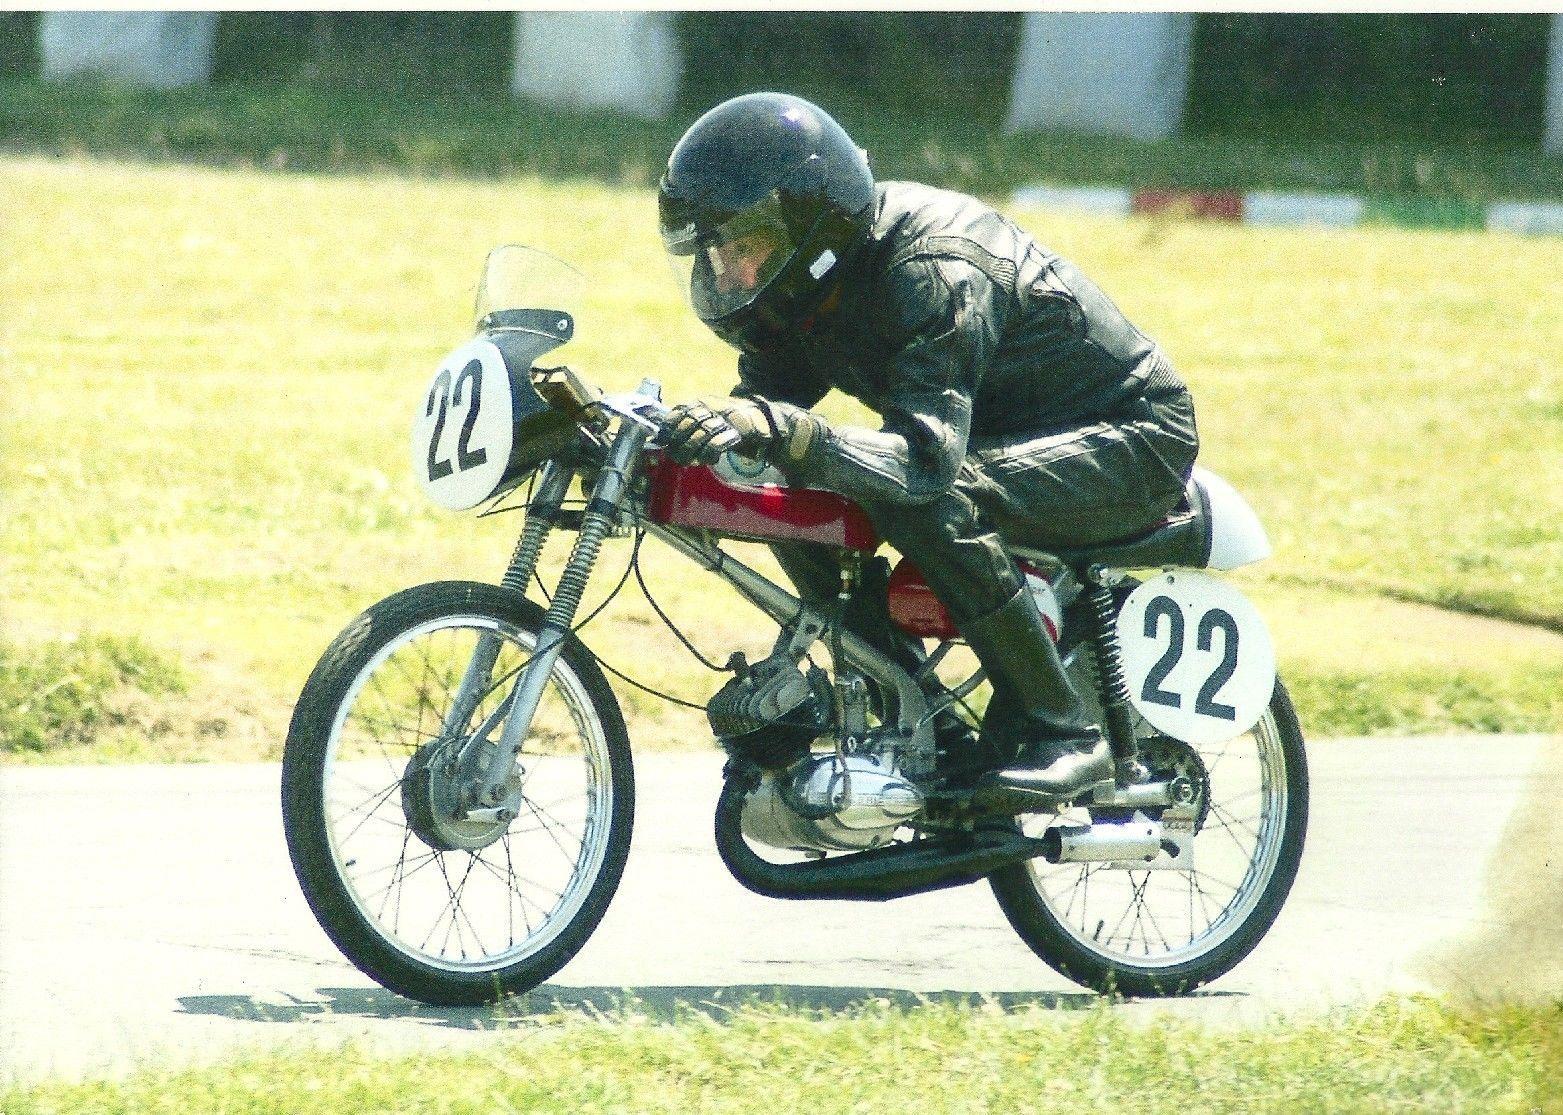 derbi gran sport classic 50cc racing motorcycle picture. Black Bedroom Furniture Sets. Home Design Ideas